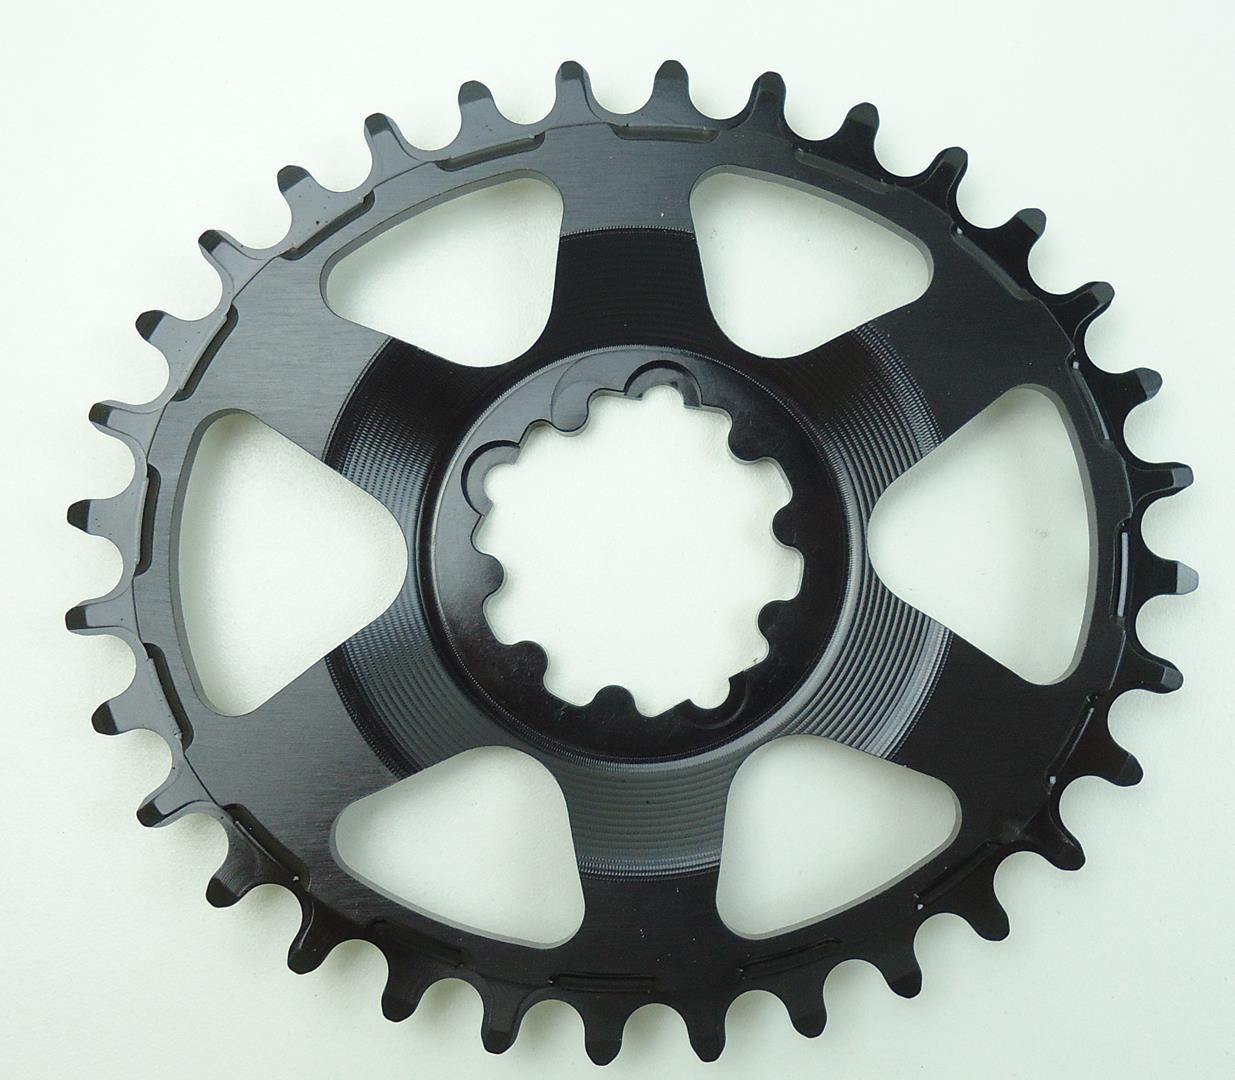 Coroa Oval Bicicleta Session para Sram 32 34T Direct Mount 6mm Off Set Para Uso 1x11 12v